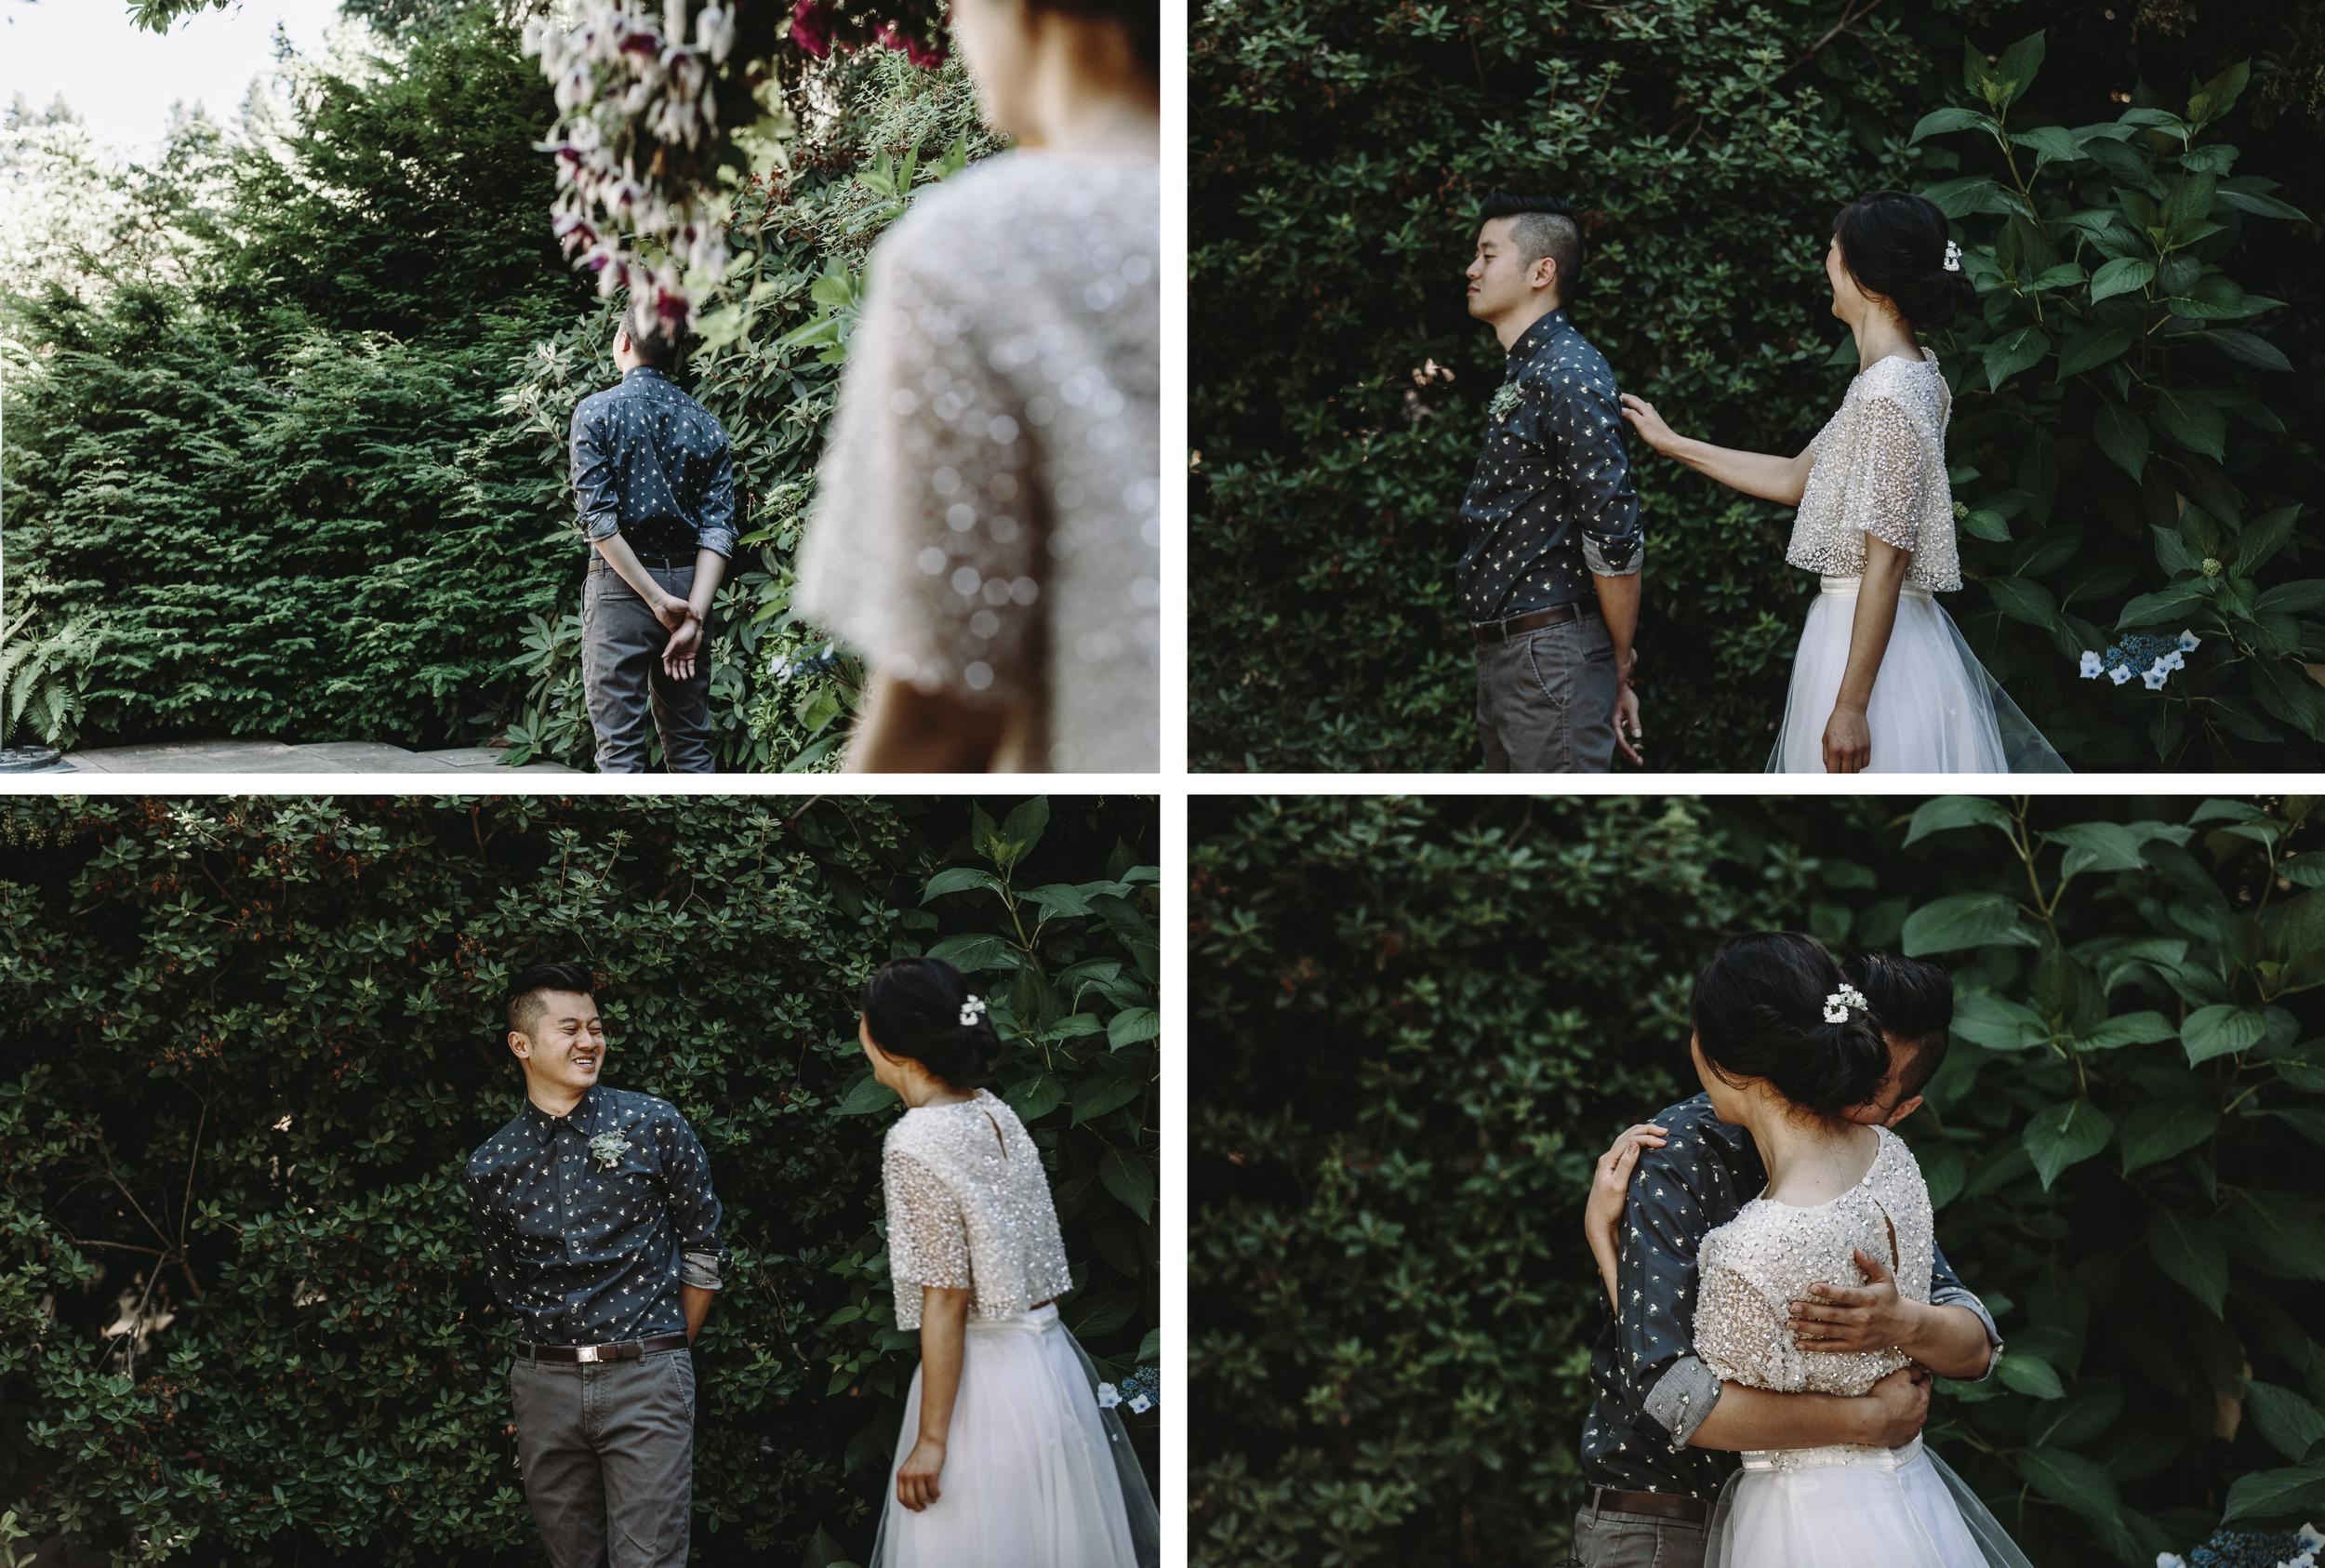 jess-hunter-seattle-artistic-wedding-photographer-4035 copy.jpg